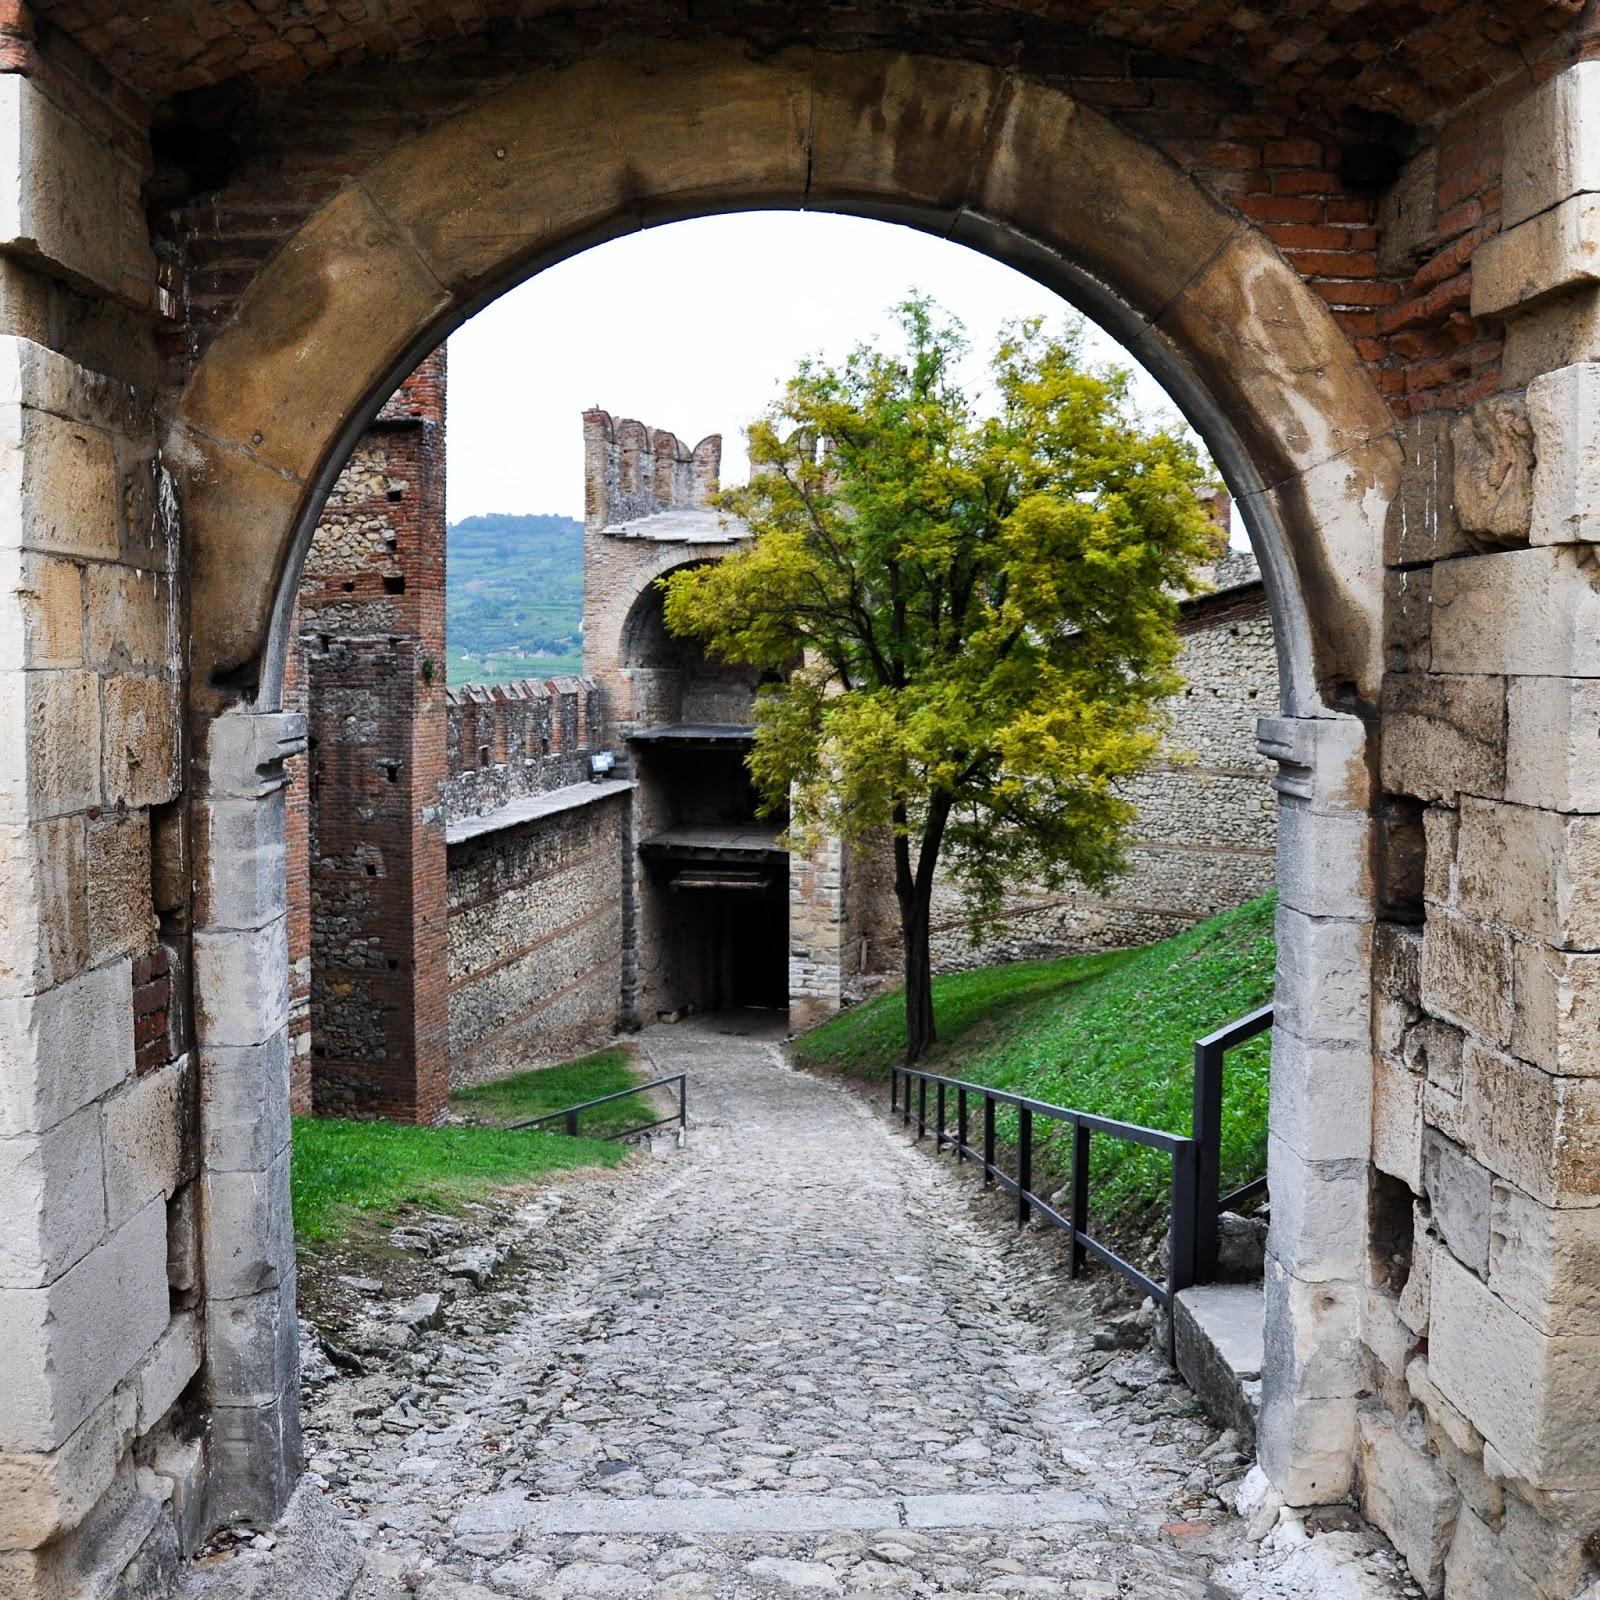 Inside Soave Castle, Soave, Veneto, Italy